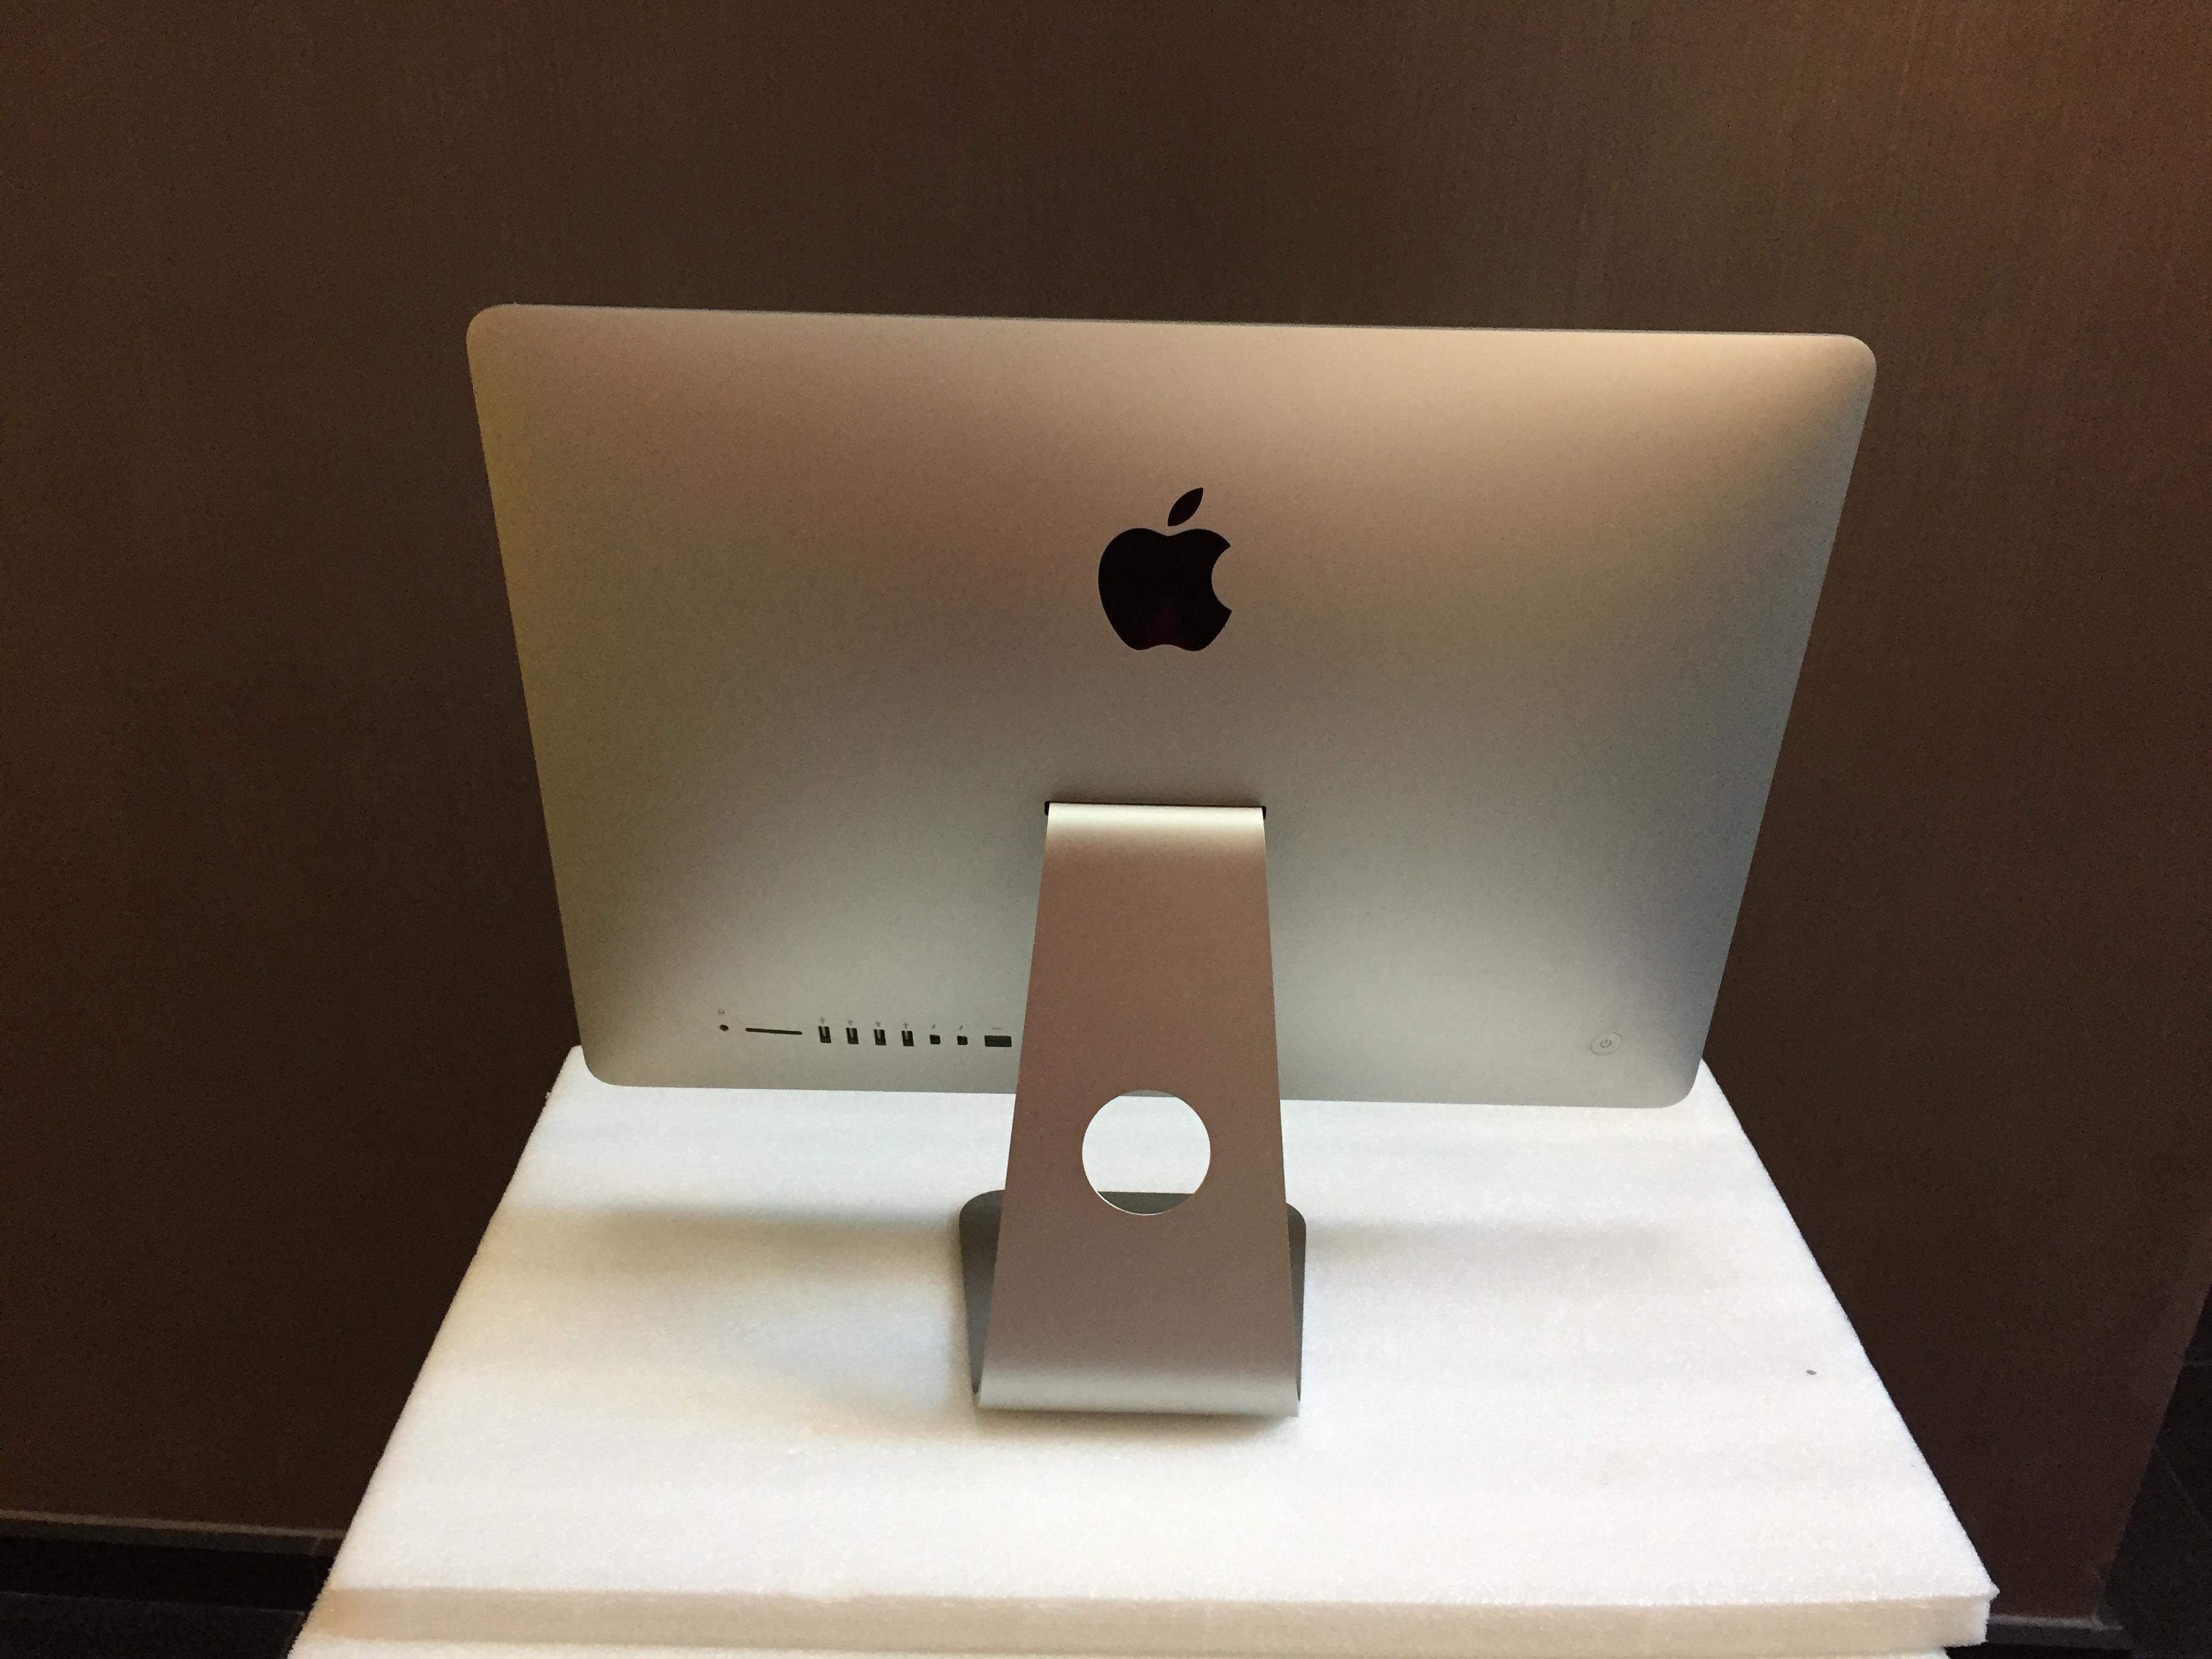 iMac 21.5-inch, Intel Core i5 1,4 GHz, 8 GB, 500 GB, imagen 2